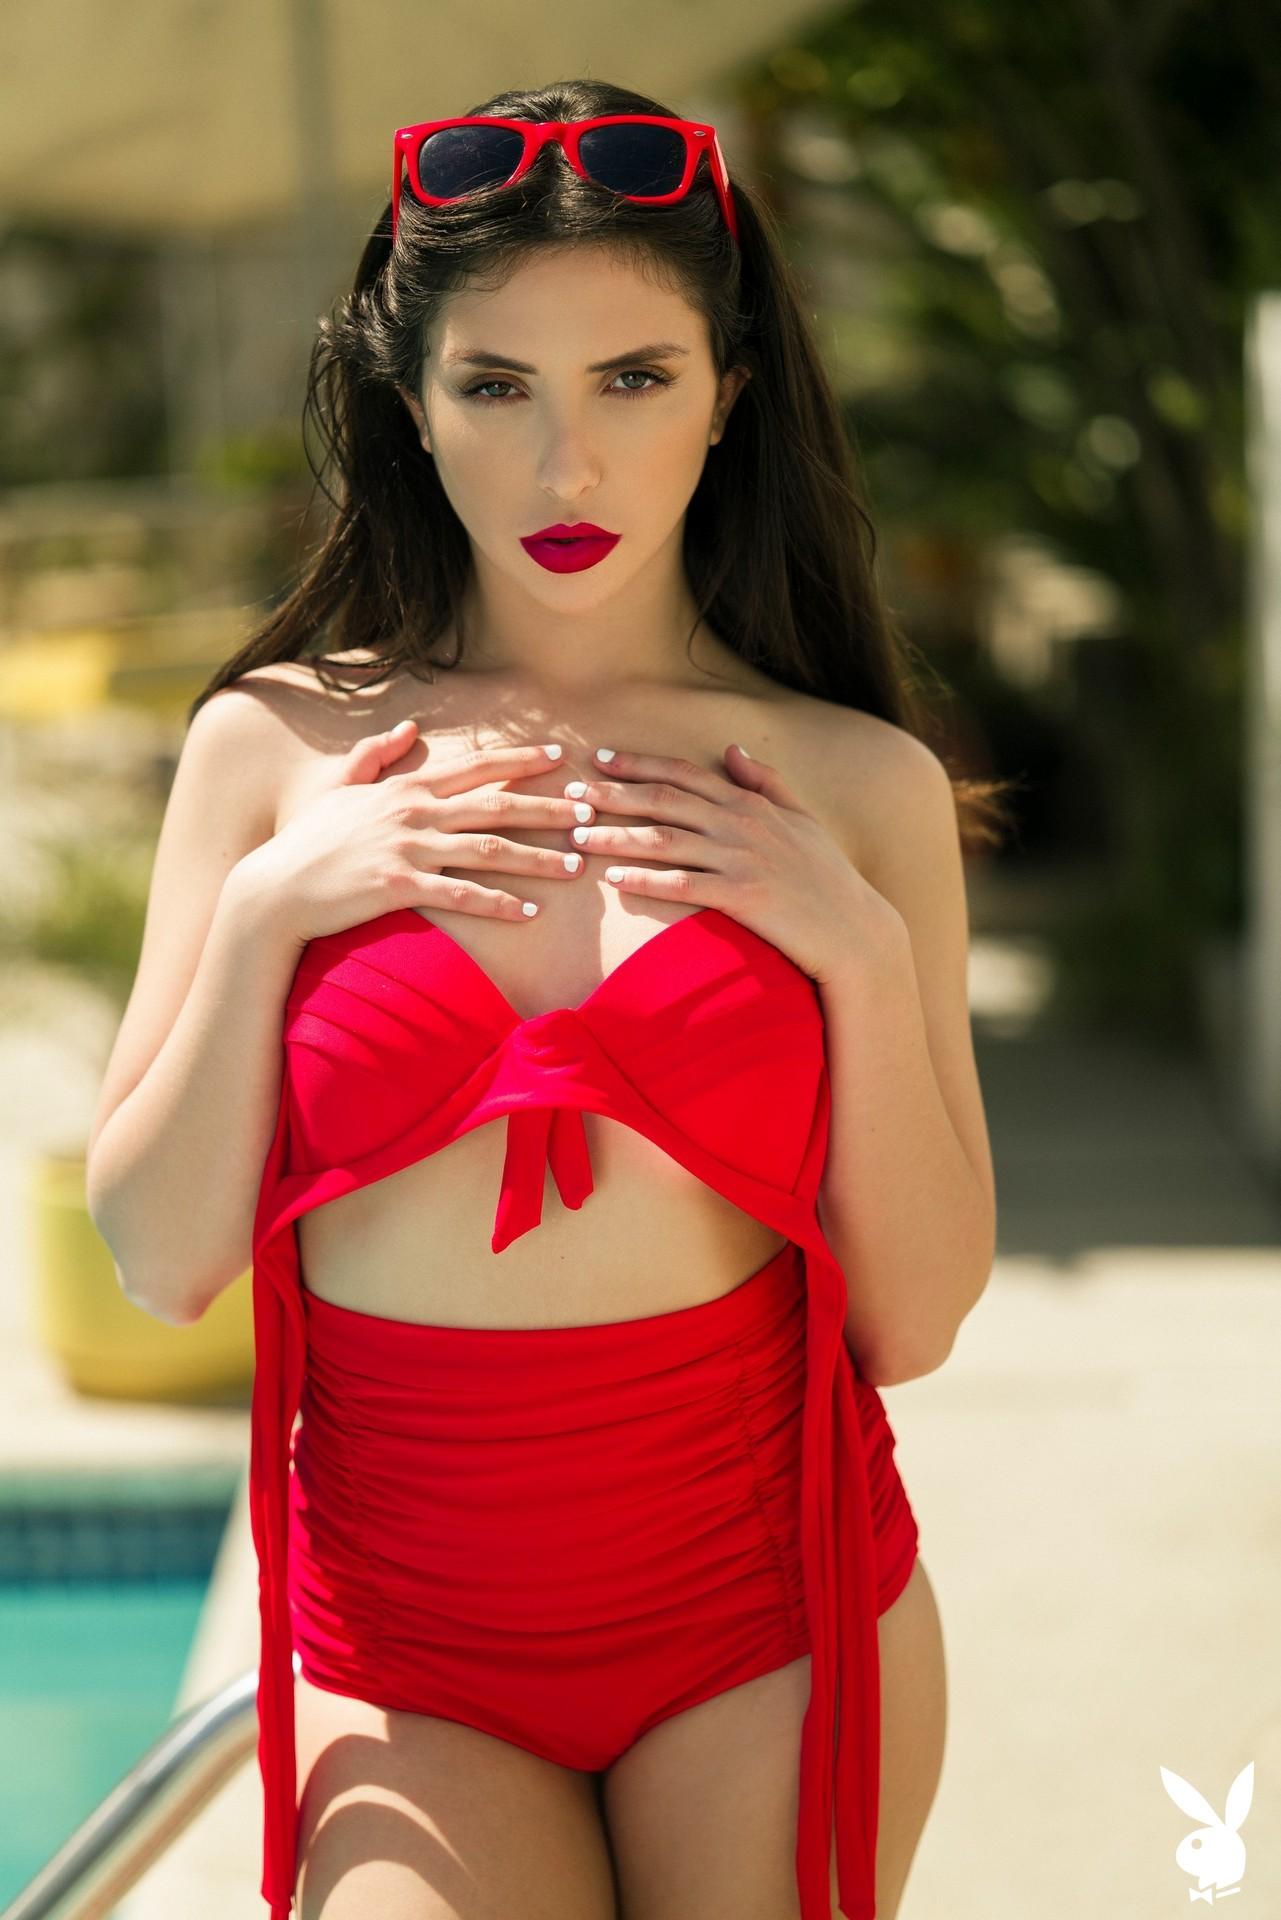 Jane Wilde In Conducting Heat Playboy Plus (8)